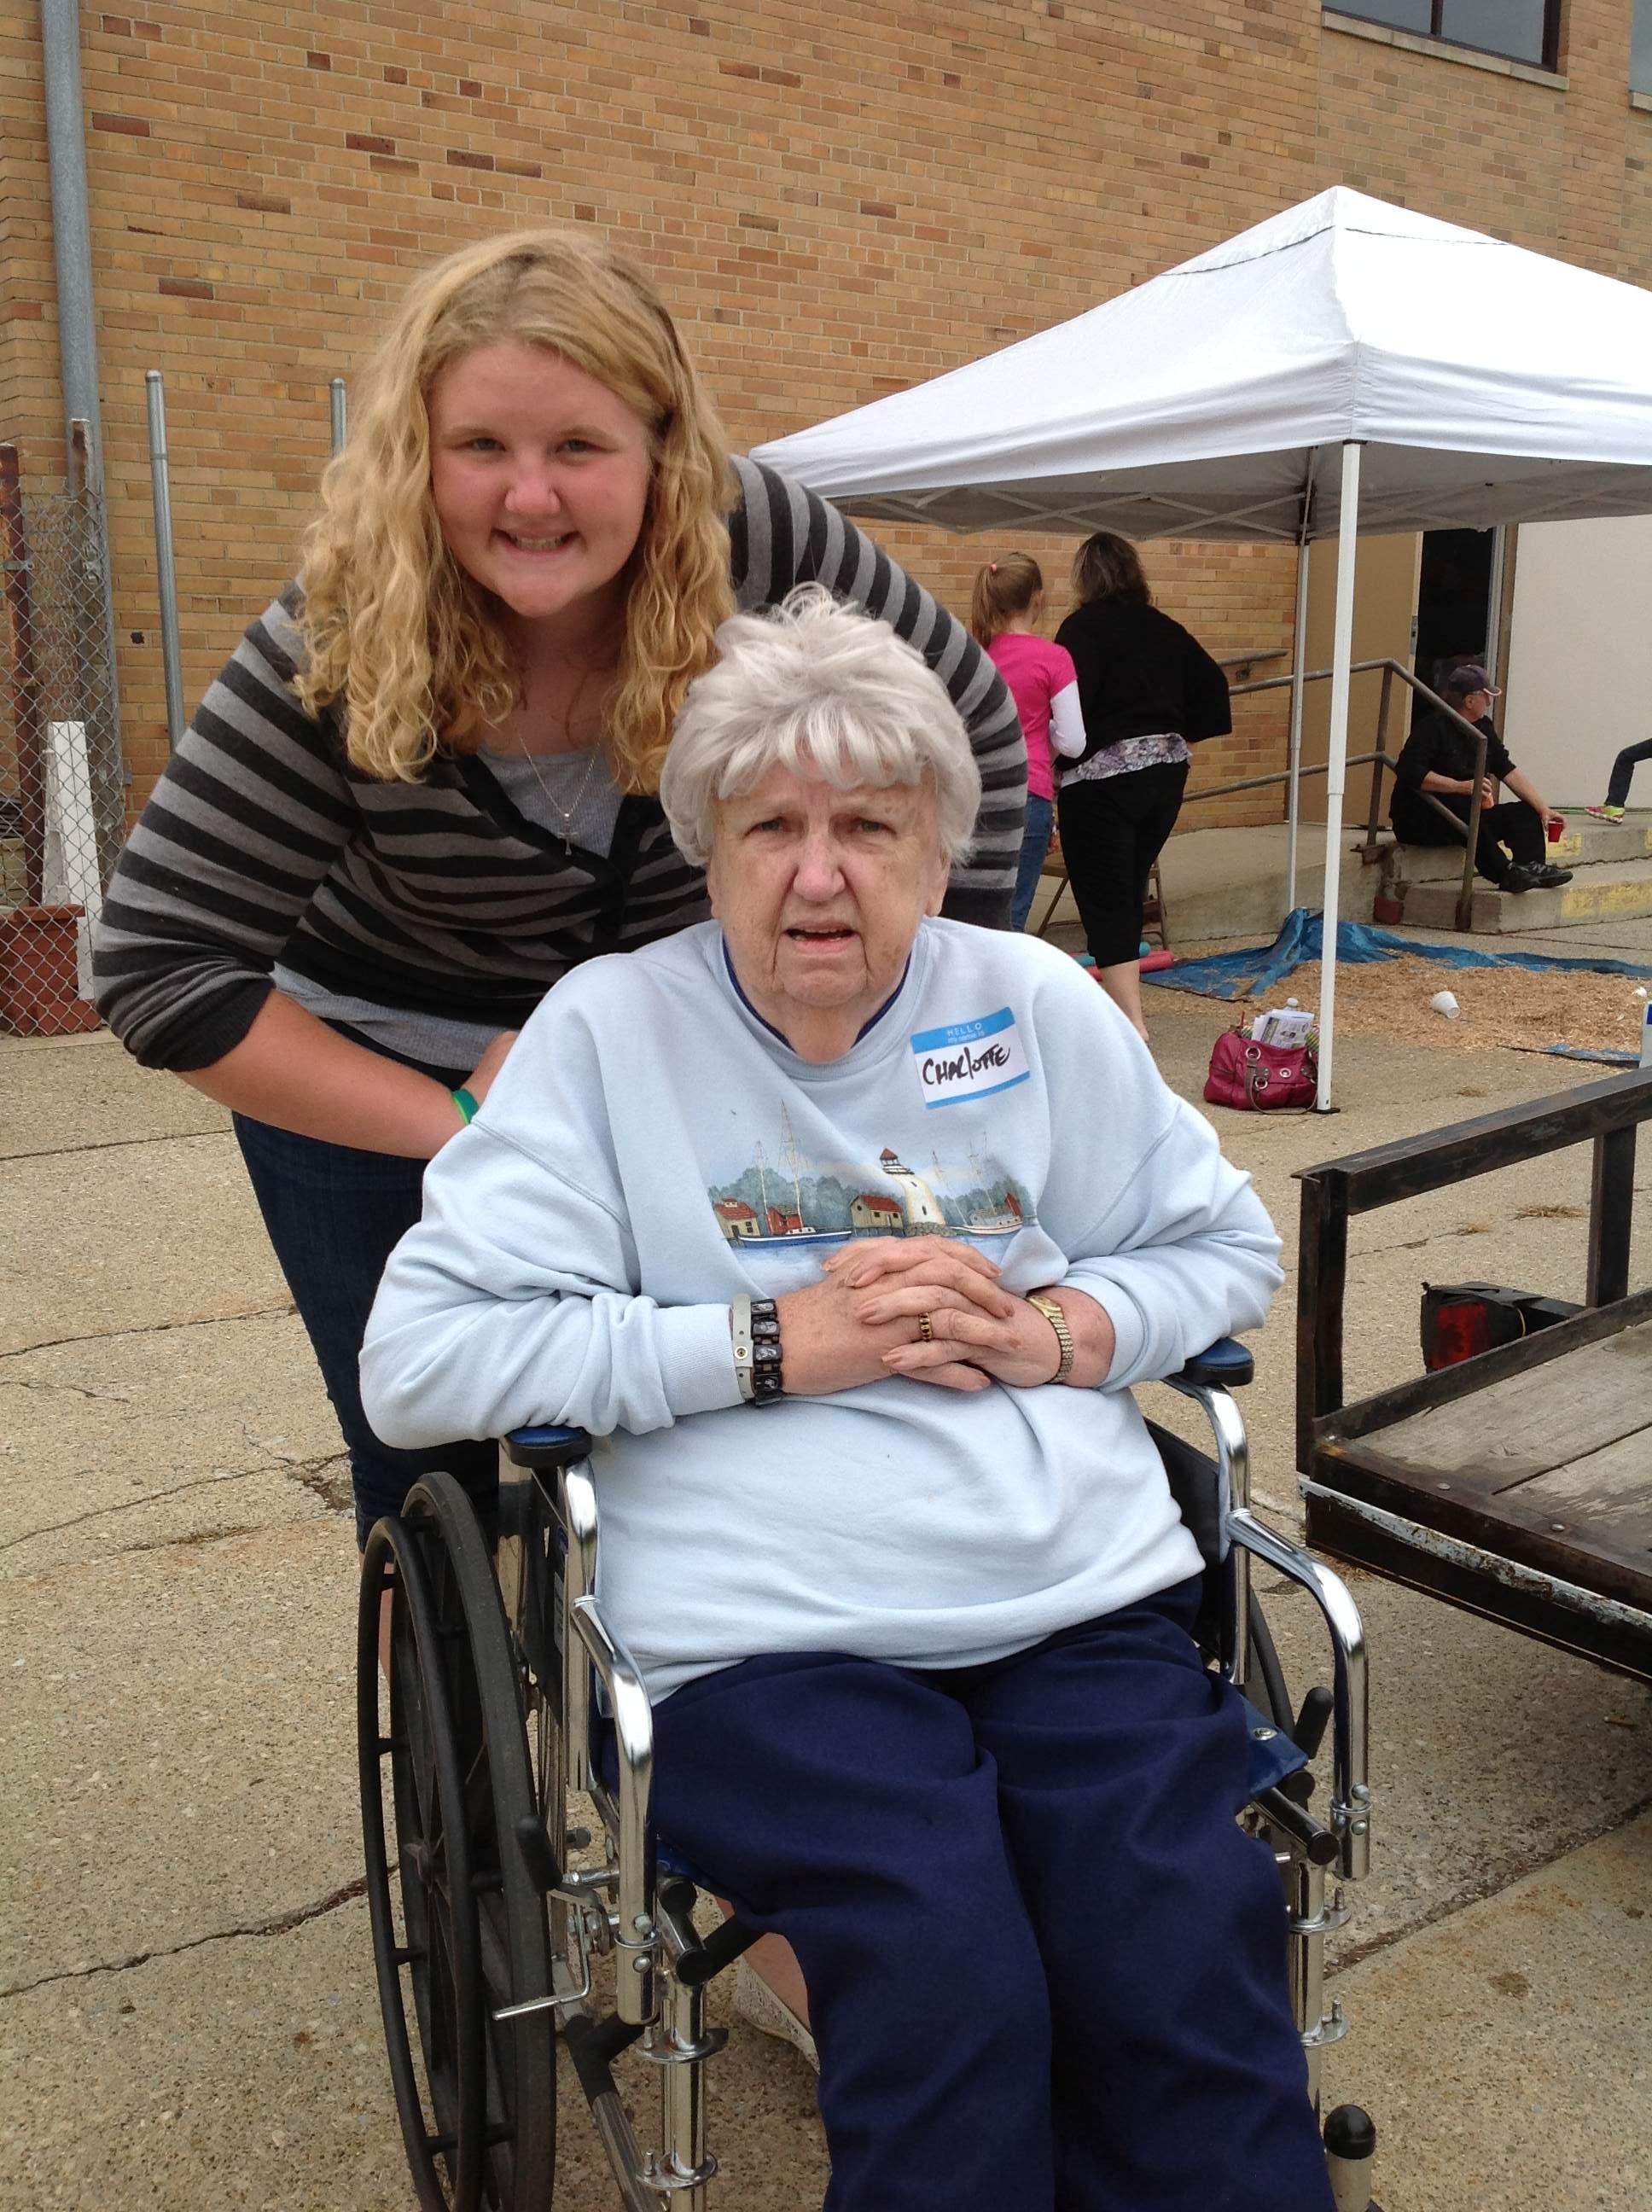 Renae Kempf and Grandmother